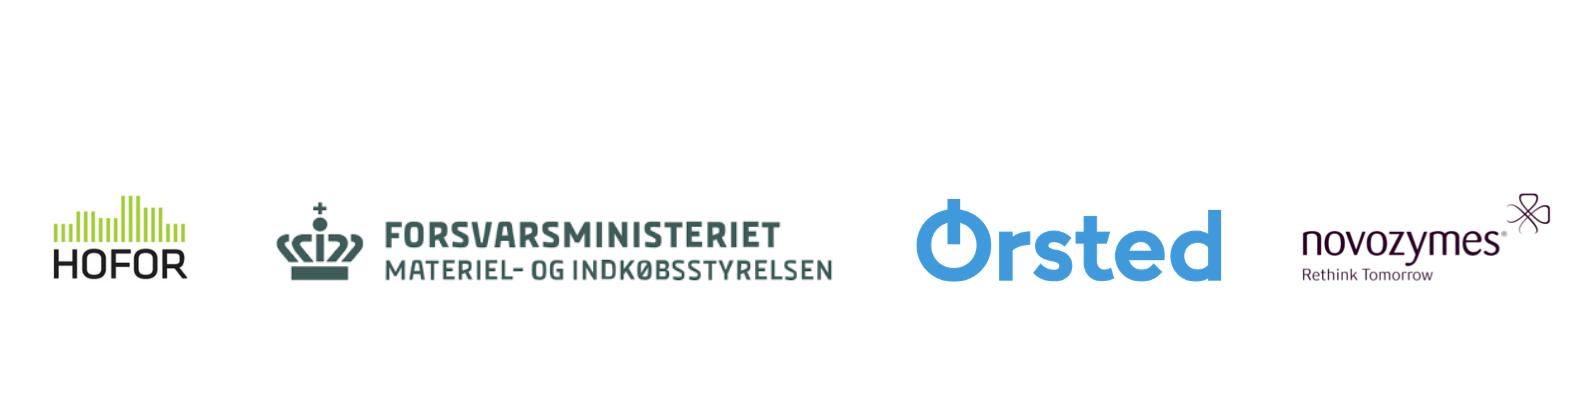 Logo_hofor_forsvarsministeriet_ørsted_novozymes